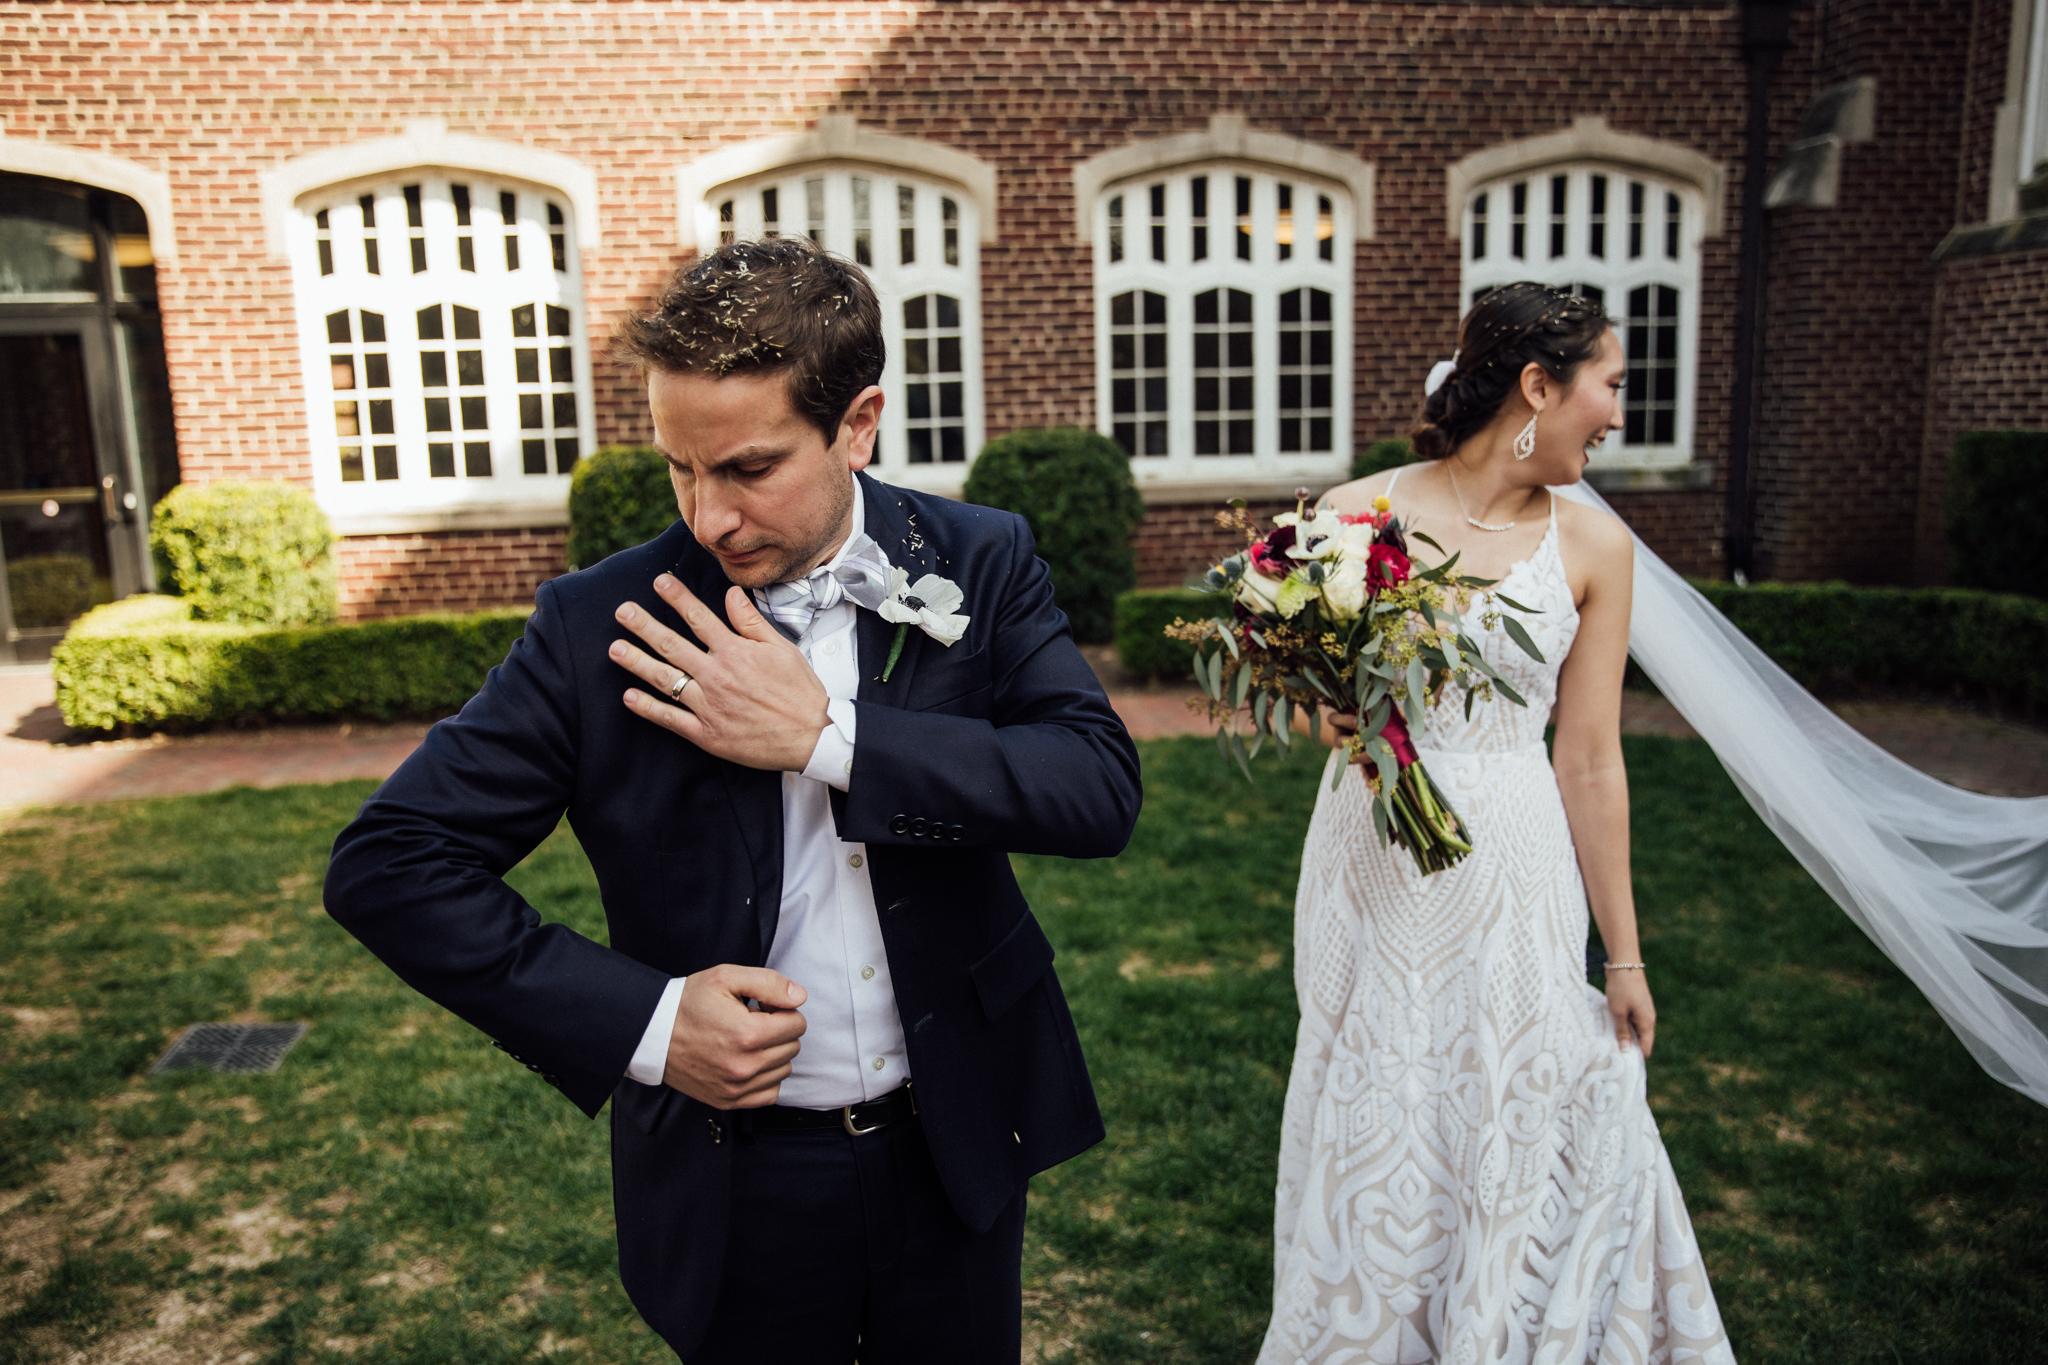 chattanooga-wedding-photographers-thewarmtharoundyou-waterhouse-pavilion-patten-chapel-wedding-sam-dusty (8 of 17).jpg